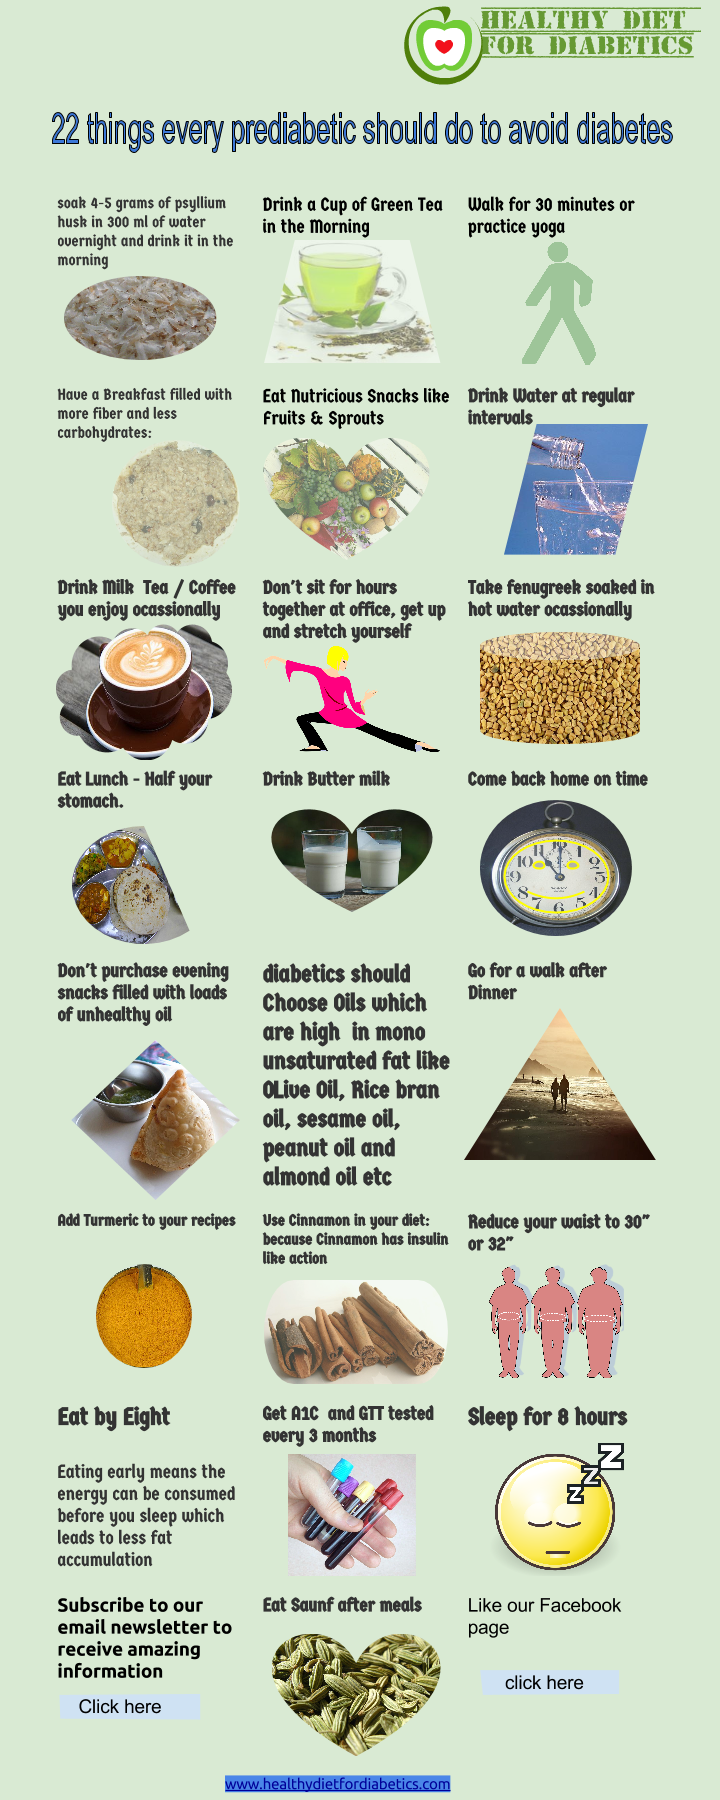 22 things every prediabetic should do to avoid diabetes